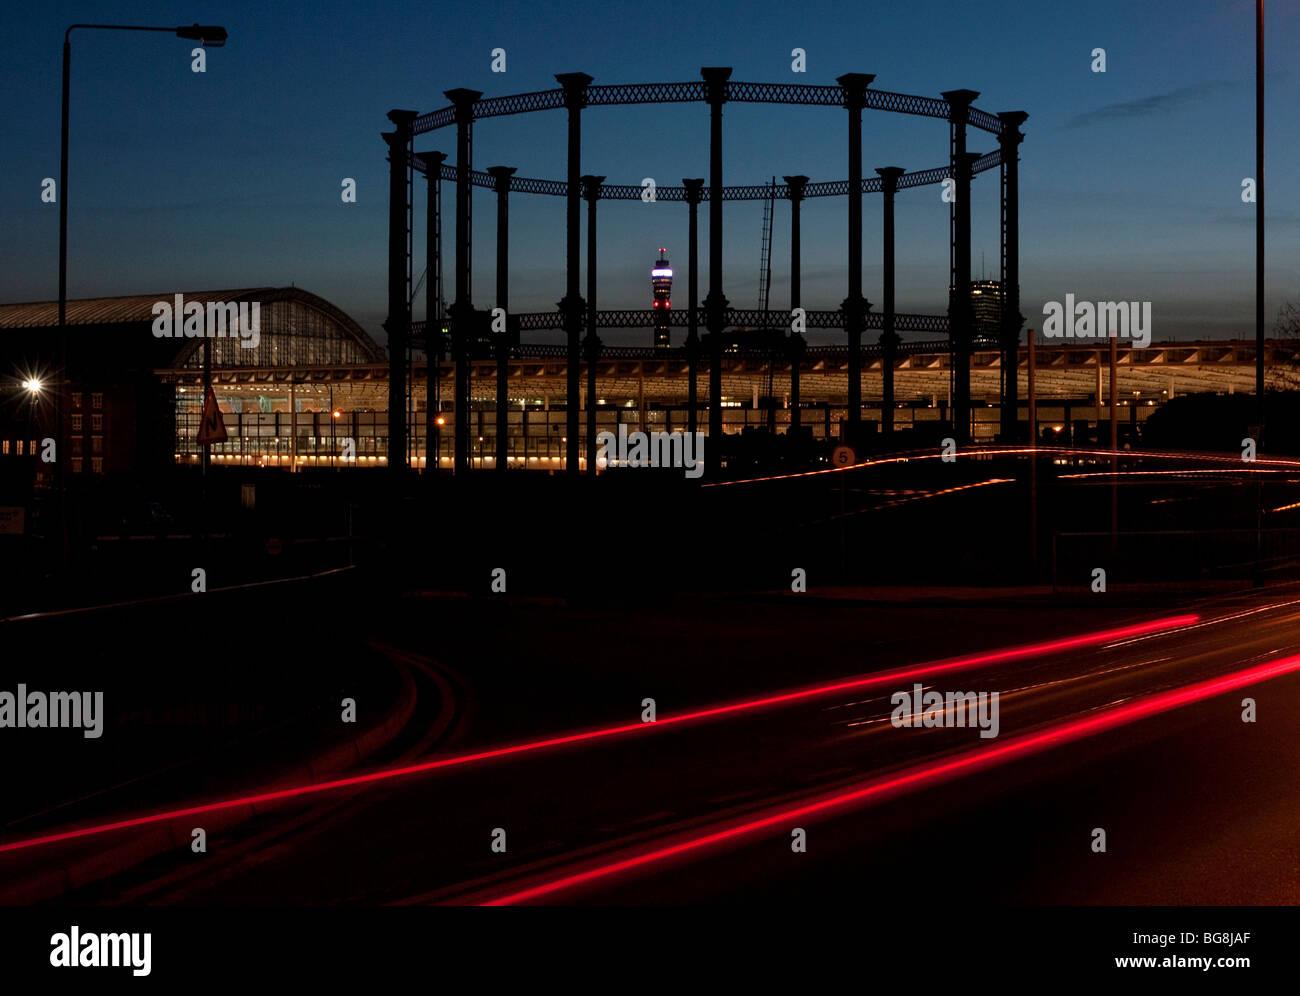 Gas storage structure next to St Pancras International Station - Stock Image